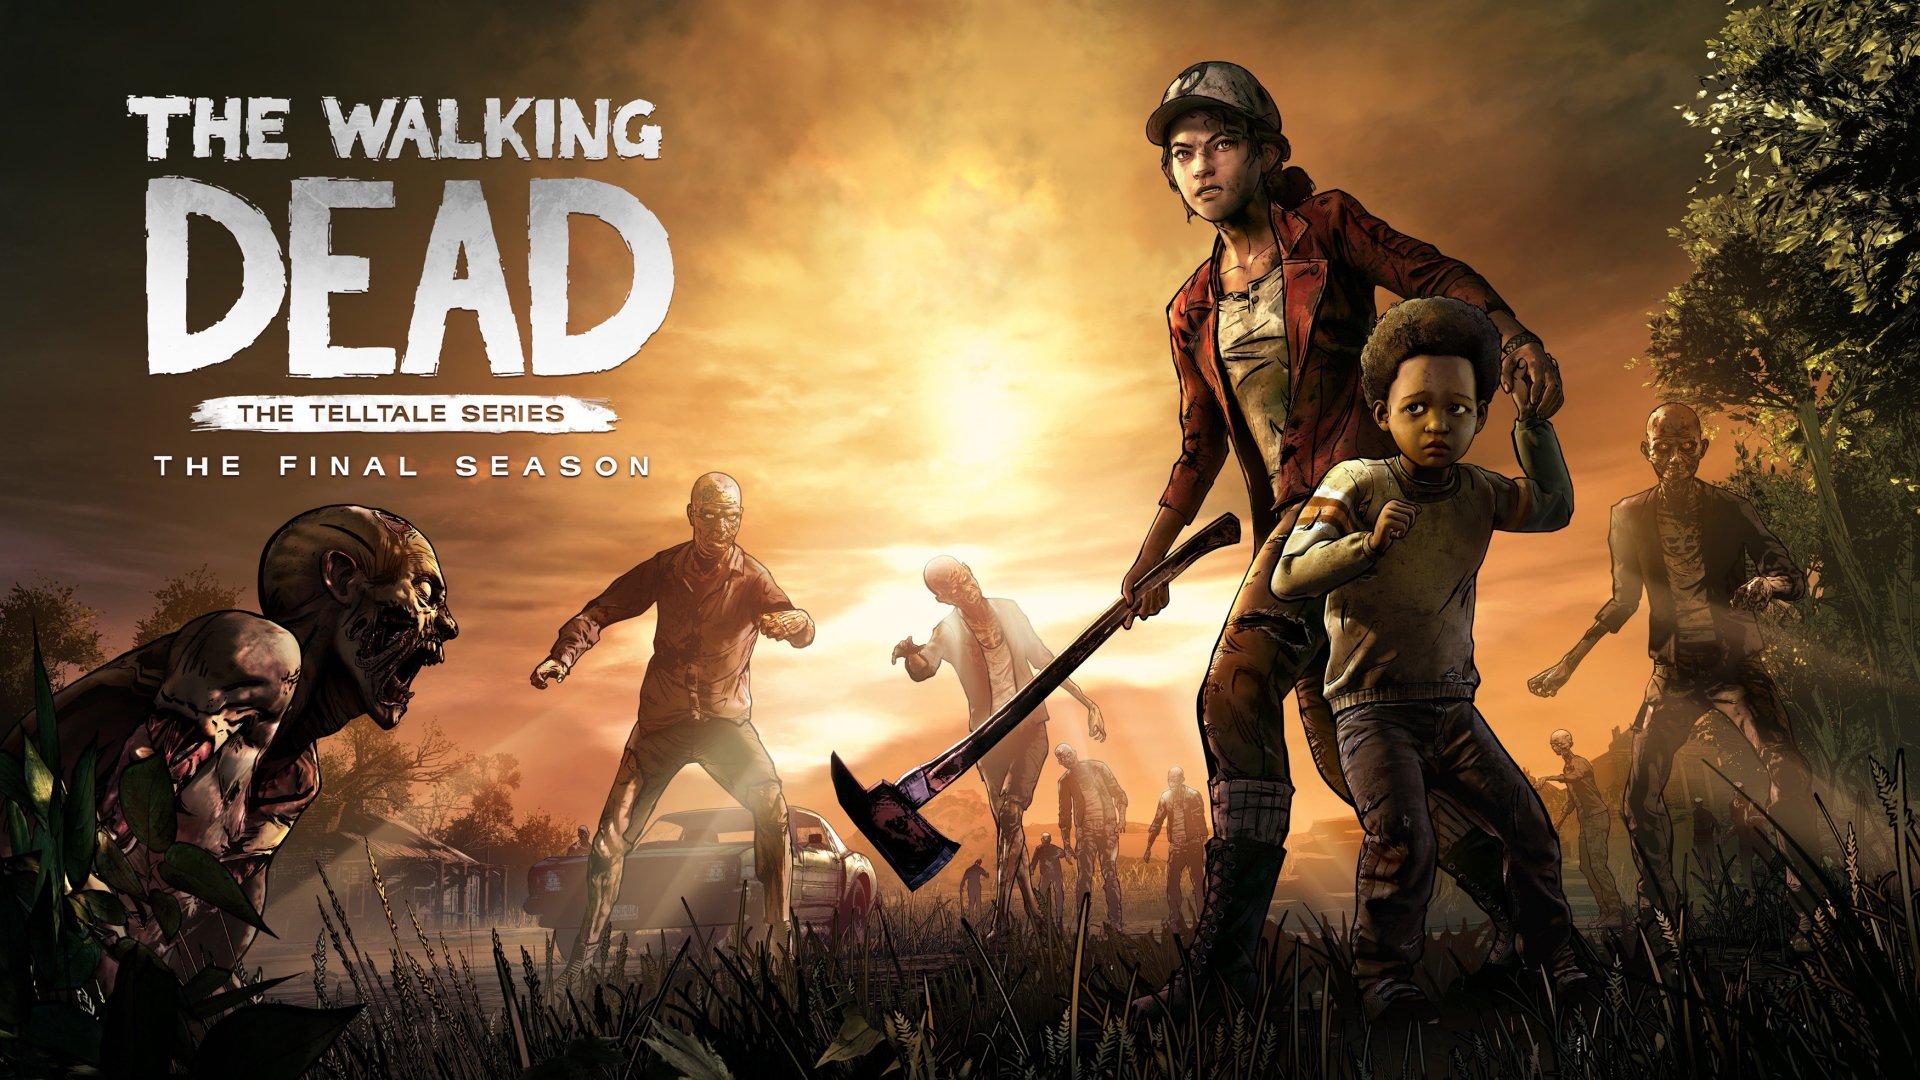 The Walking Dead: The Final Season offline activation 2019